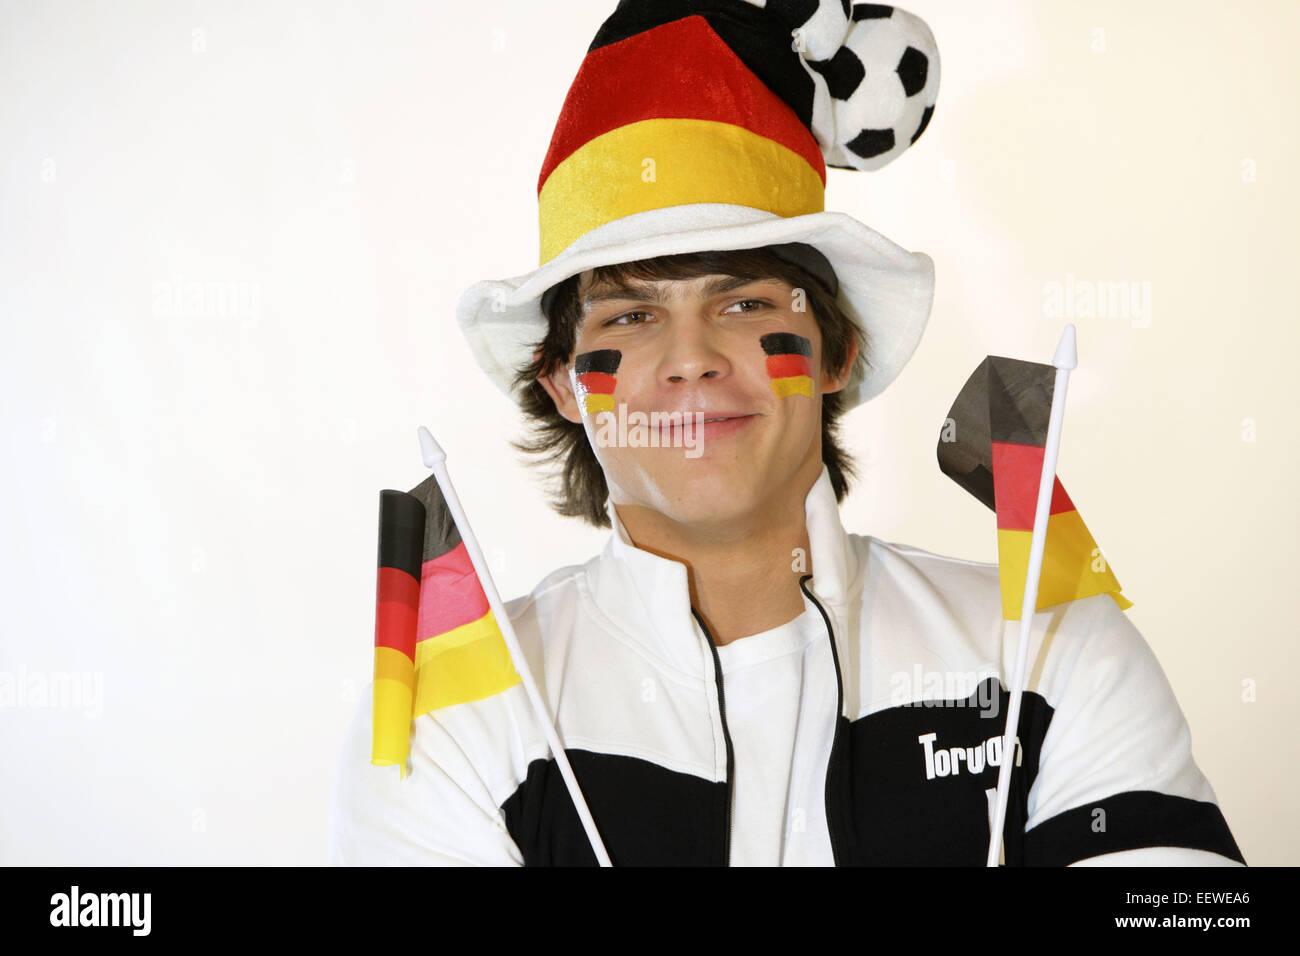 Mann Portrait Fan Fans Fussballfan Fussballfans Zuschauer Faehnchen Hut Publikum Freude Begeisterung Fussball Laenderspiel - Stock Image